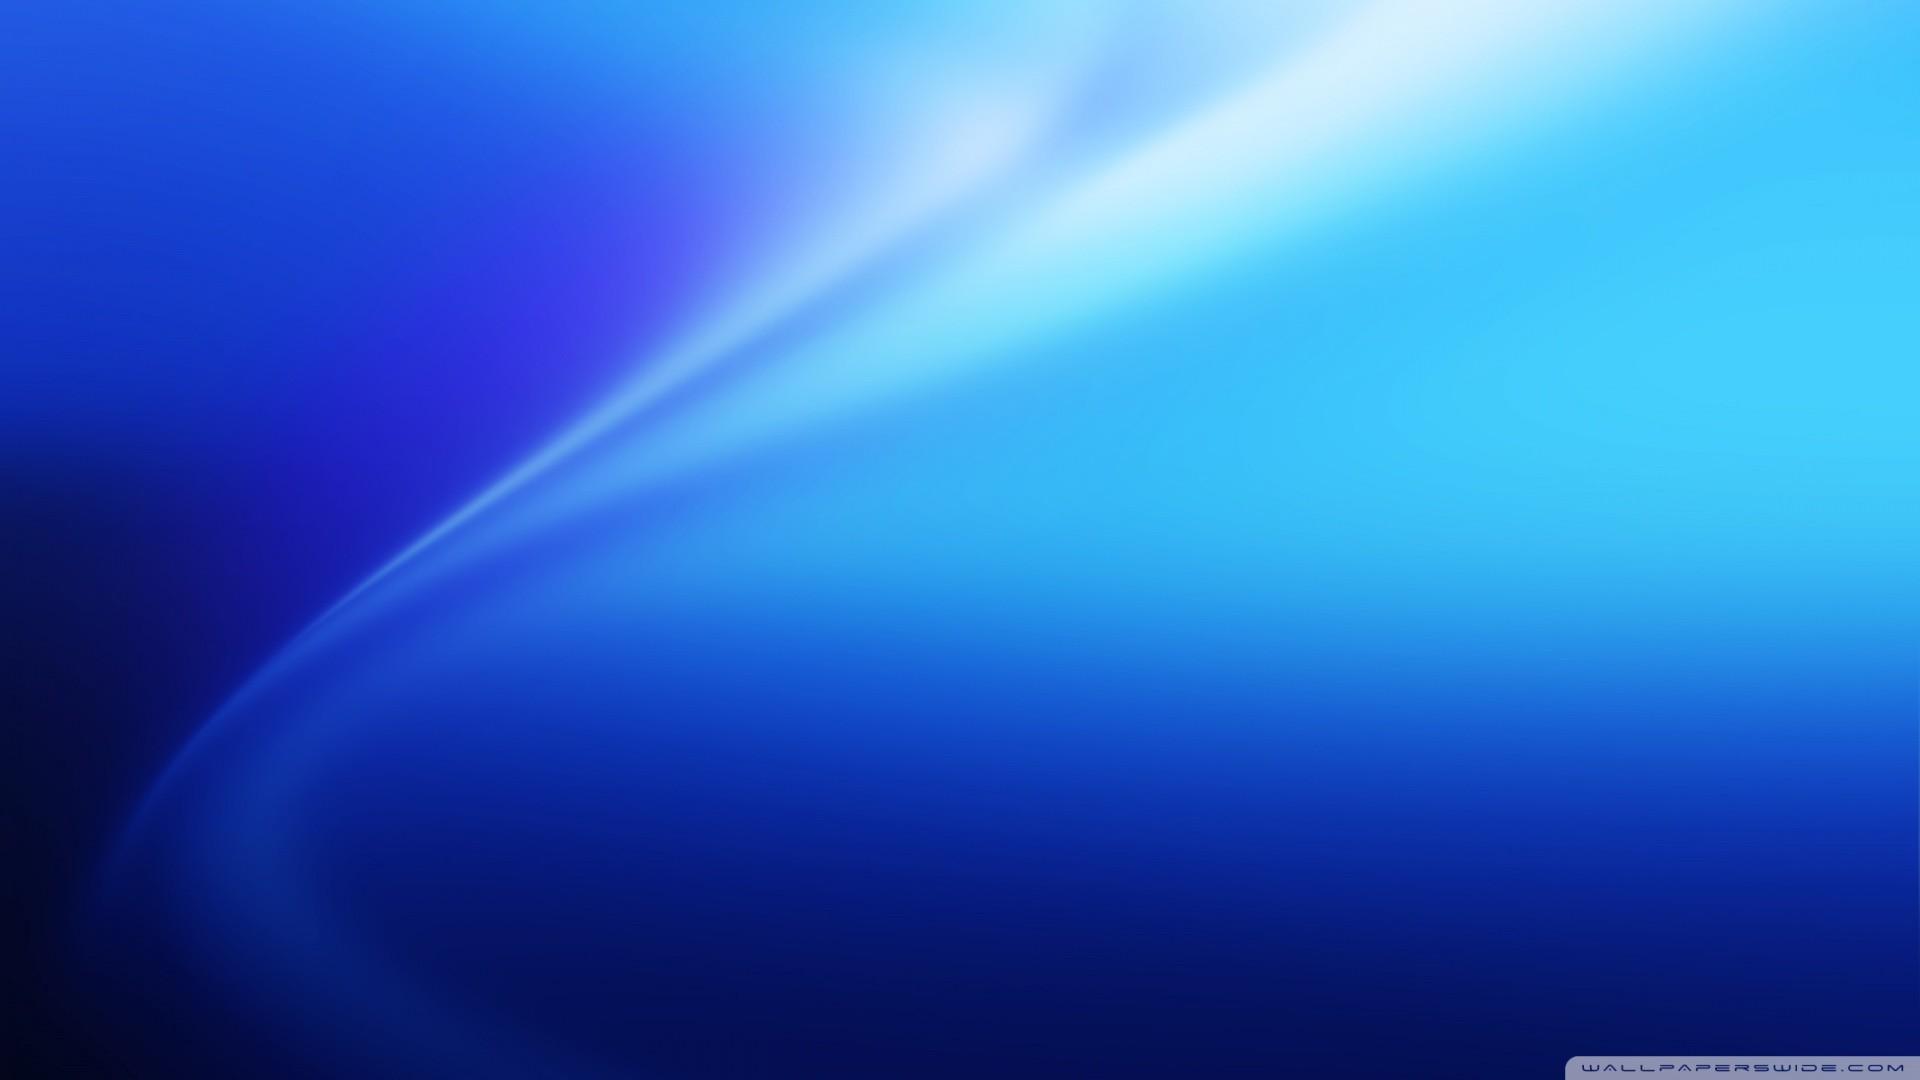 hinh nen mau xanh 59